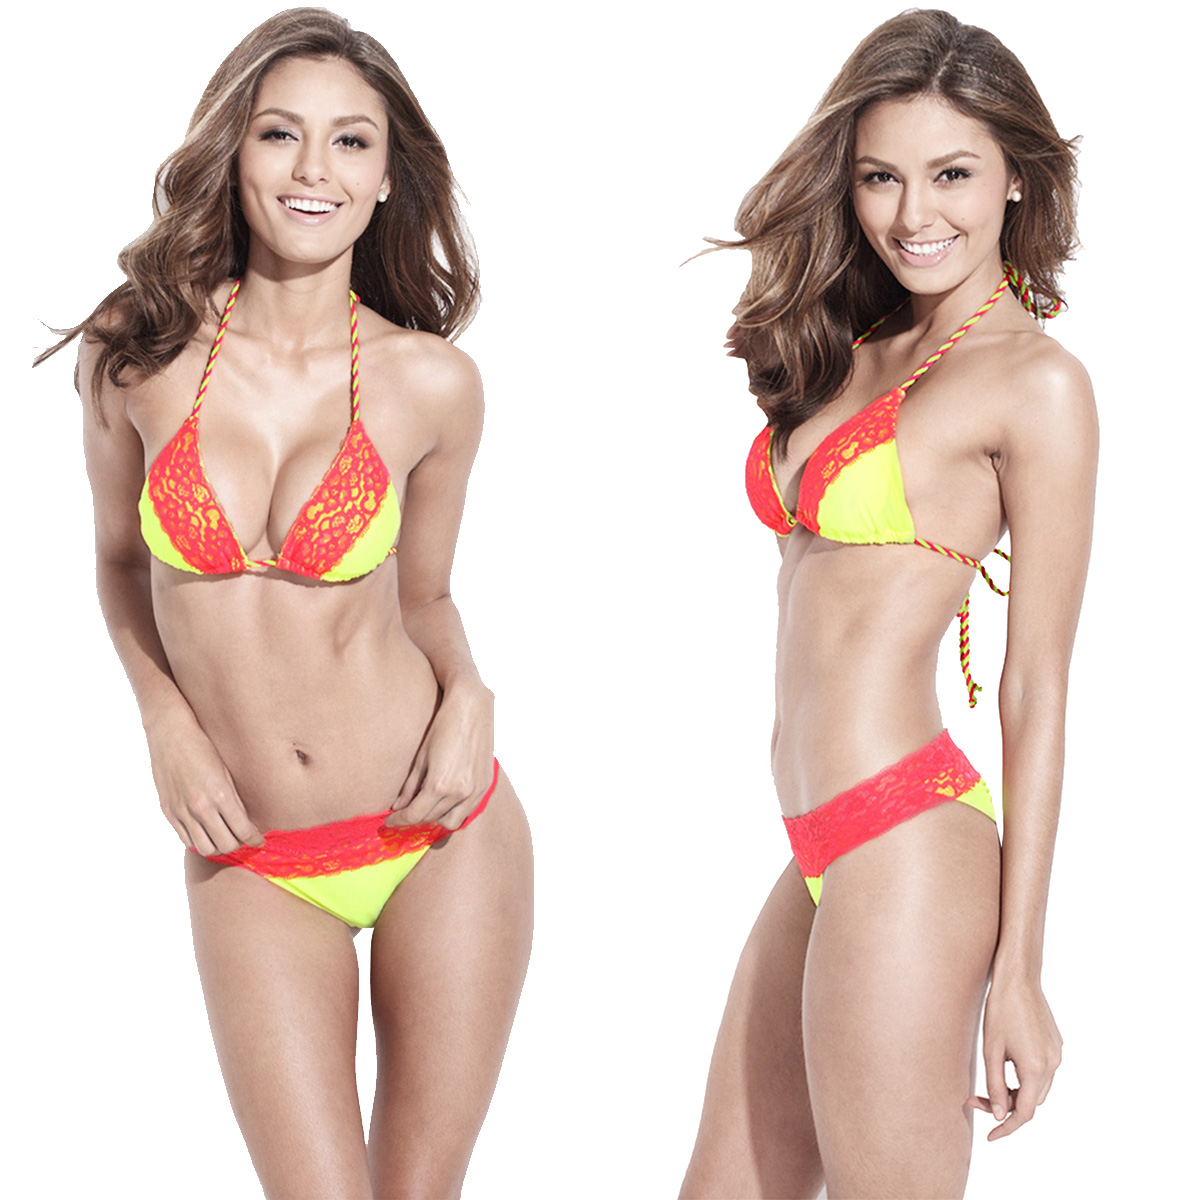 EXTRA PADS 32B Victoria Secret Swim suit Top Swimwear TANKINI PUSH UP HALTER